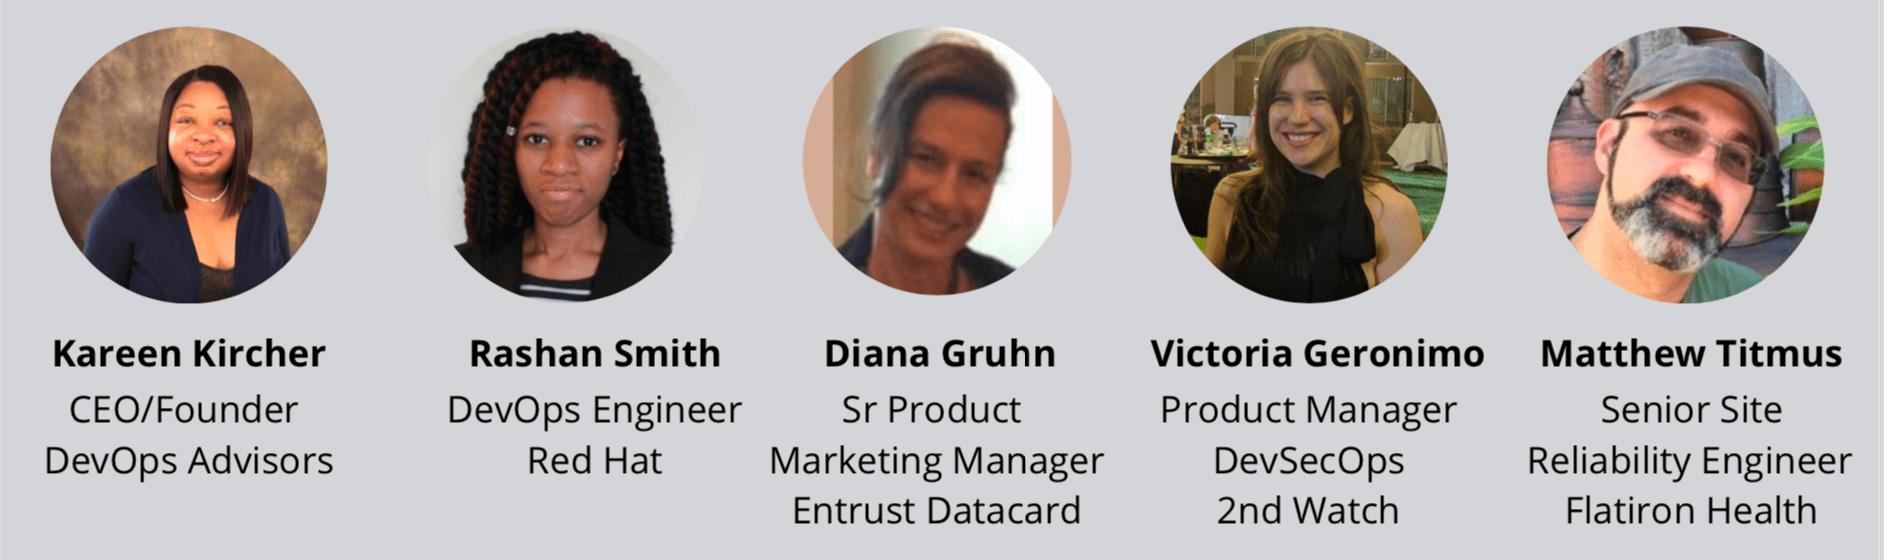 Demystifying DevOps: Panelists